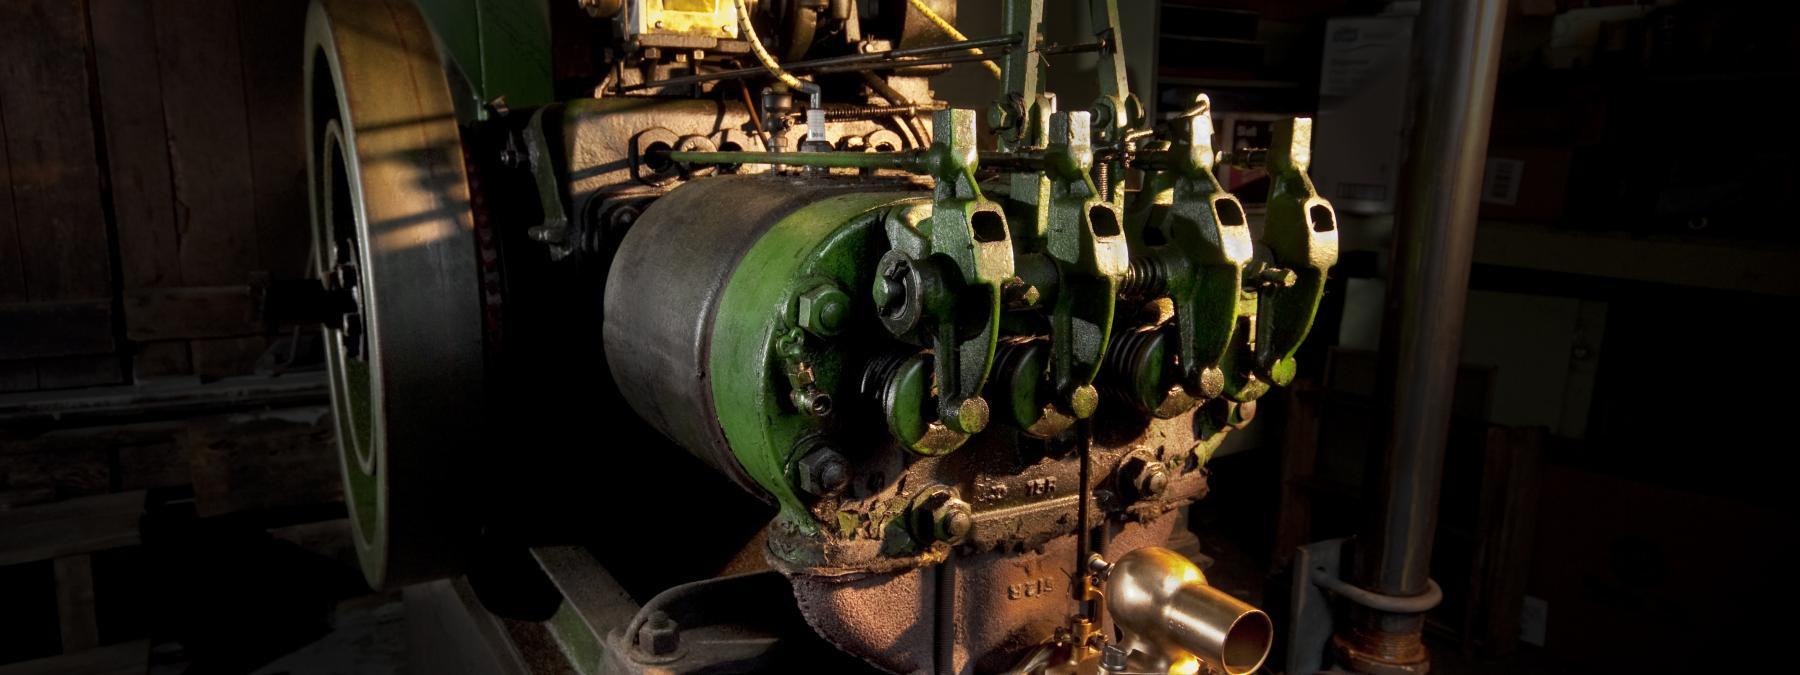 1924 Waterloo Boy Type-T Stationary Engine